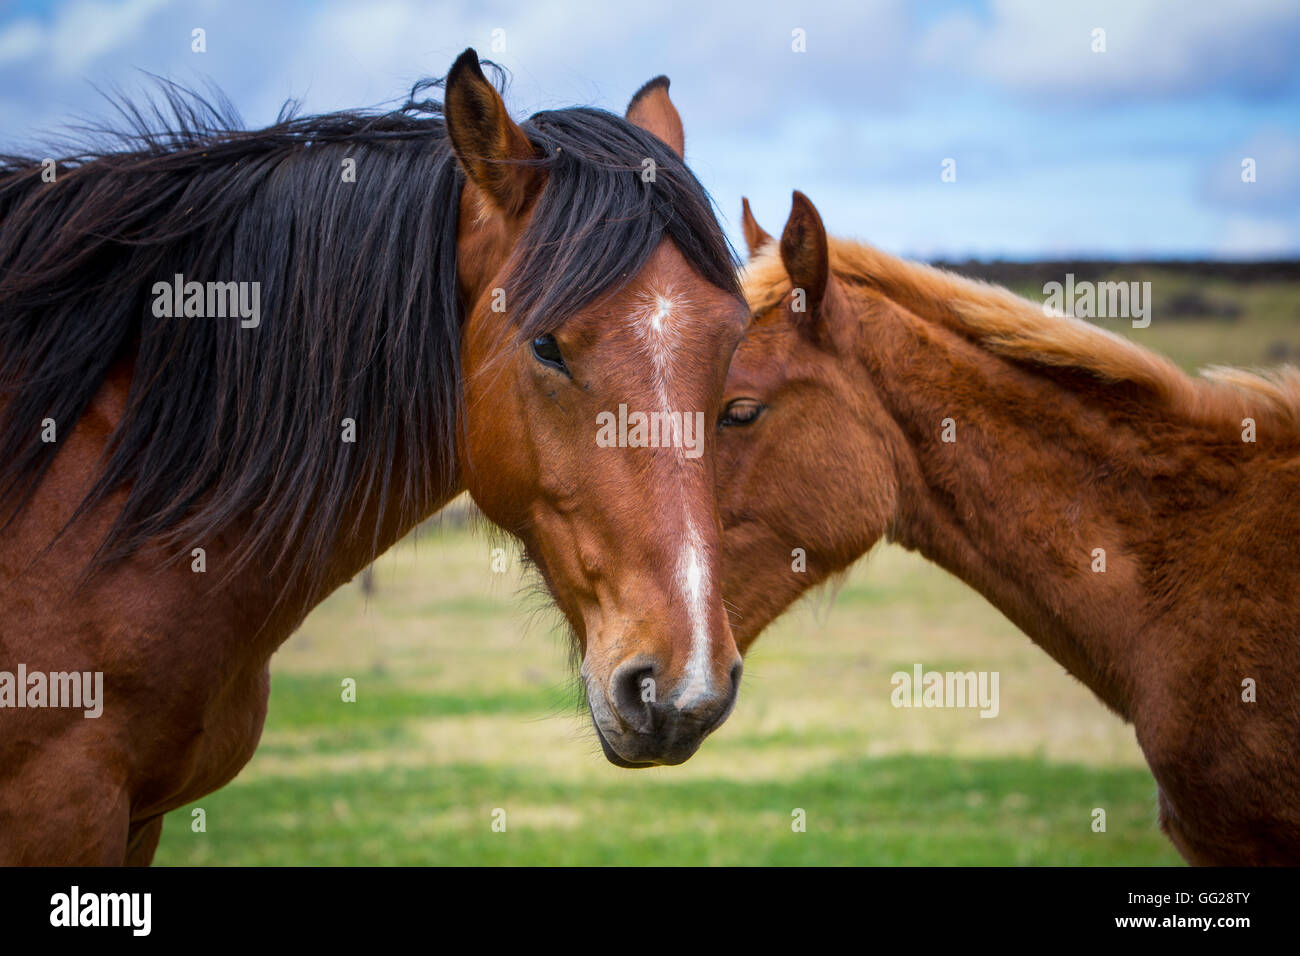 Wild Horses on Easter Island - Stock Image